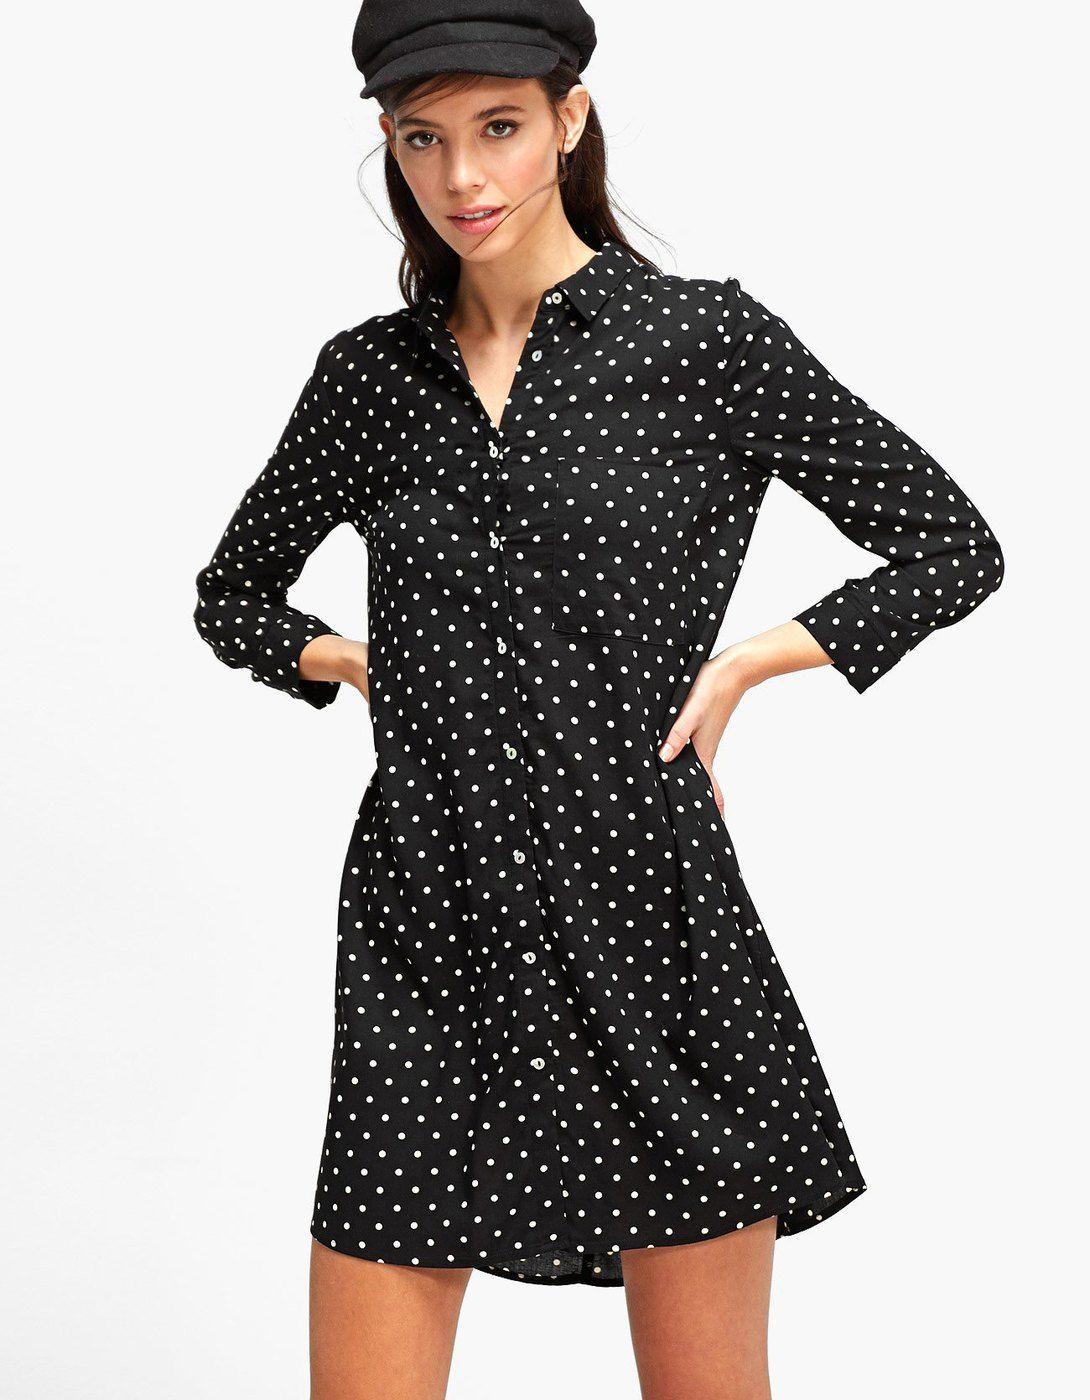 531fc55954e Printed shirt dress with 3 4 length sleeves - Dresses